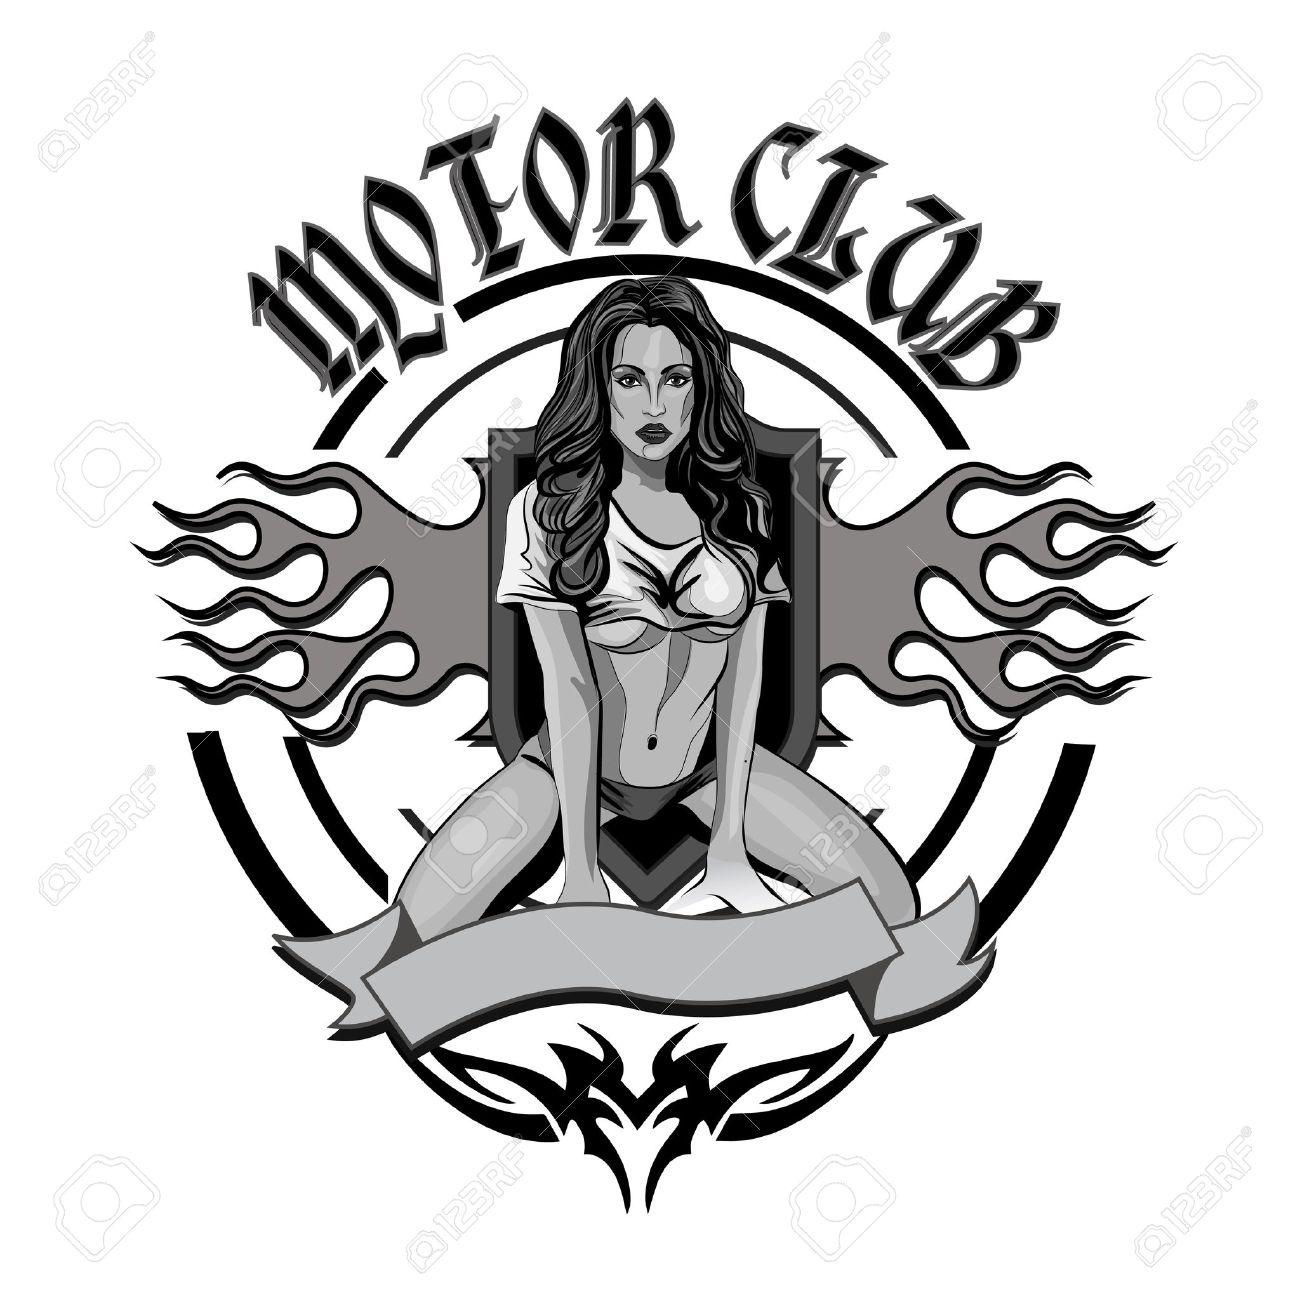 Pin up motorcycle line art jpg - Pin Up Girl Vintage Motorcycle Garage Motor Club Emblem With Sexy Girl